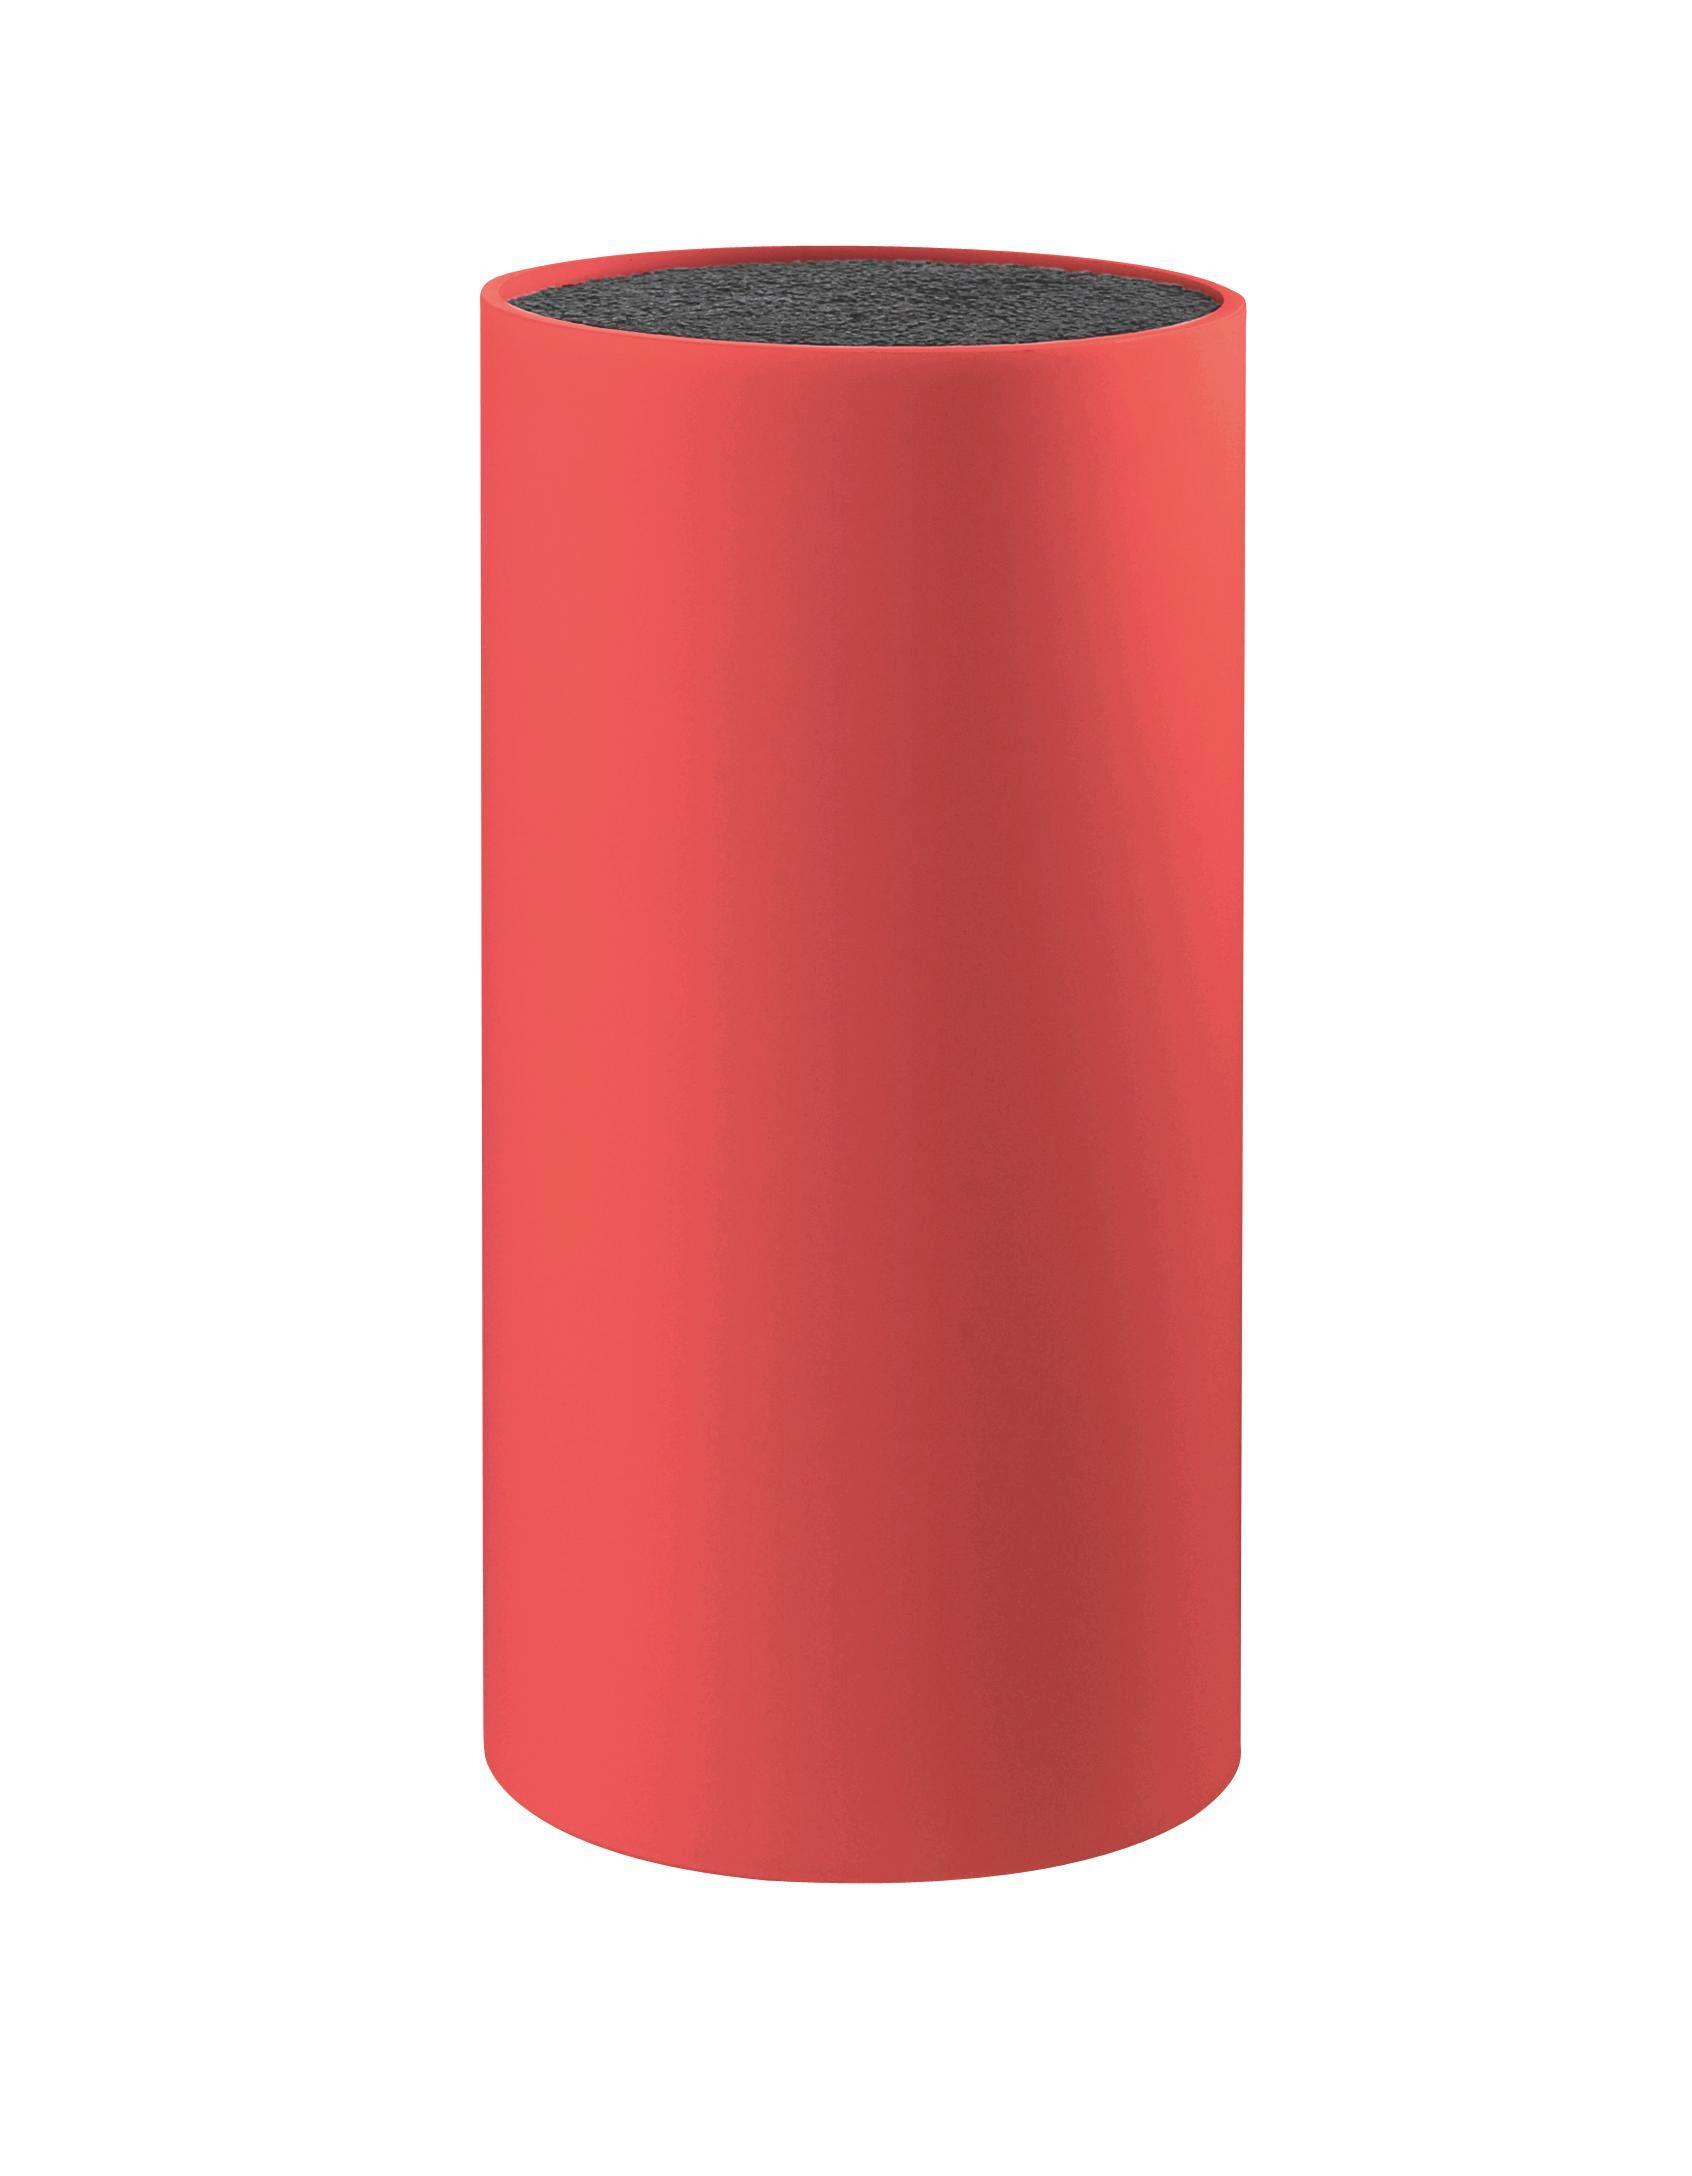 Késtartó Blokk Thorsten - piros, konvencionális, műanyag (11/22cm) - MÖMAX modern living